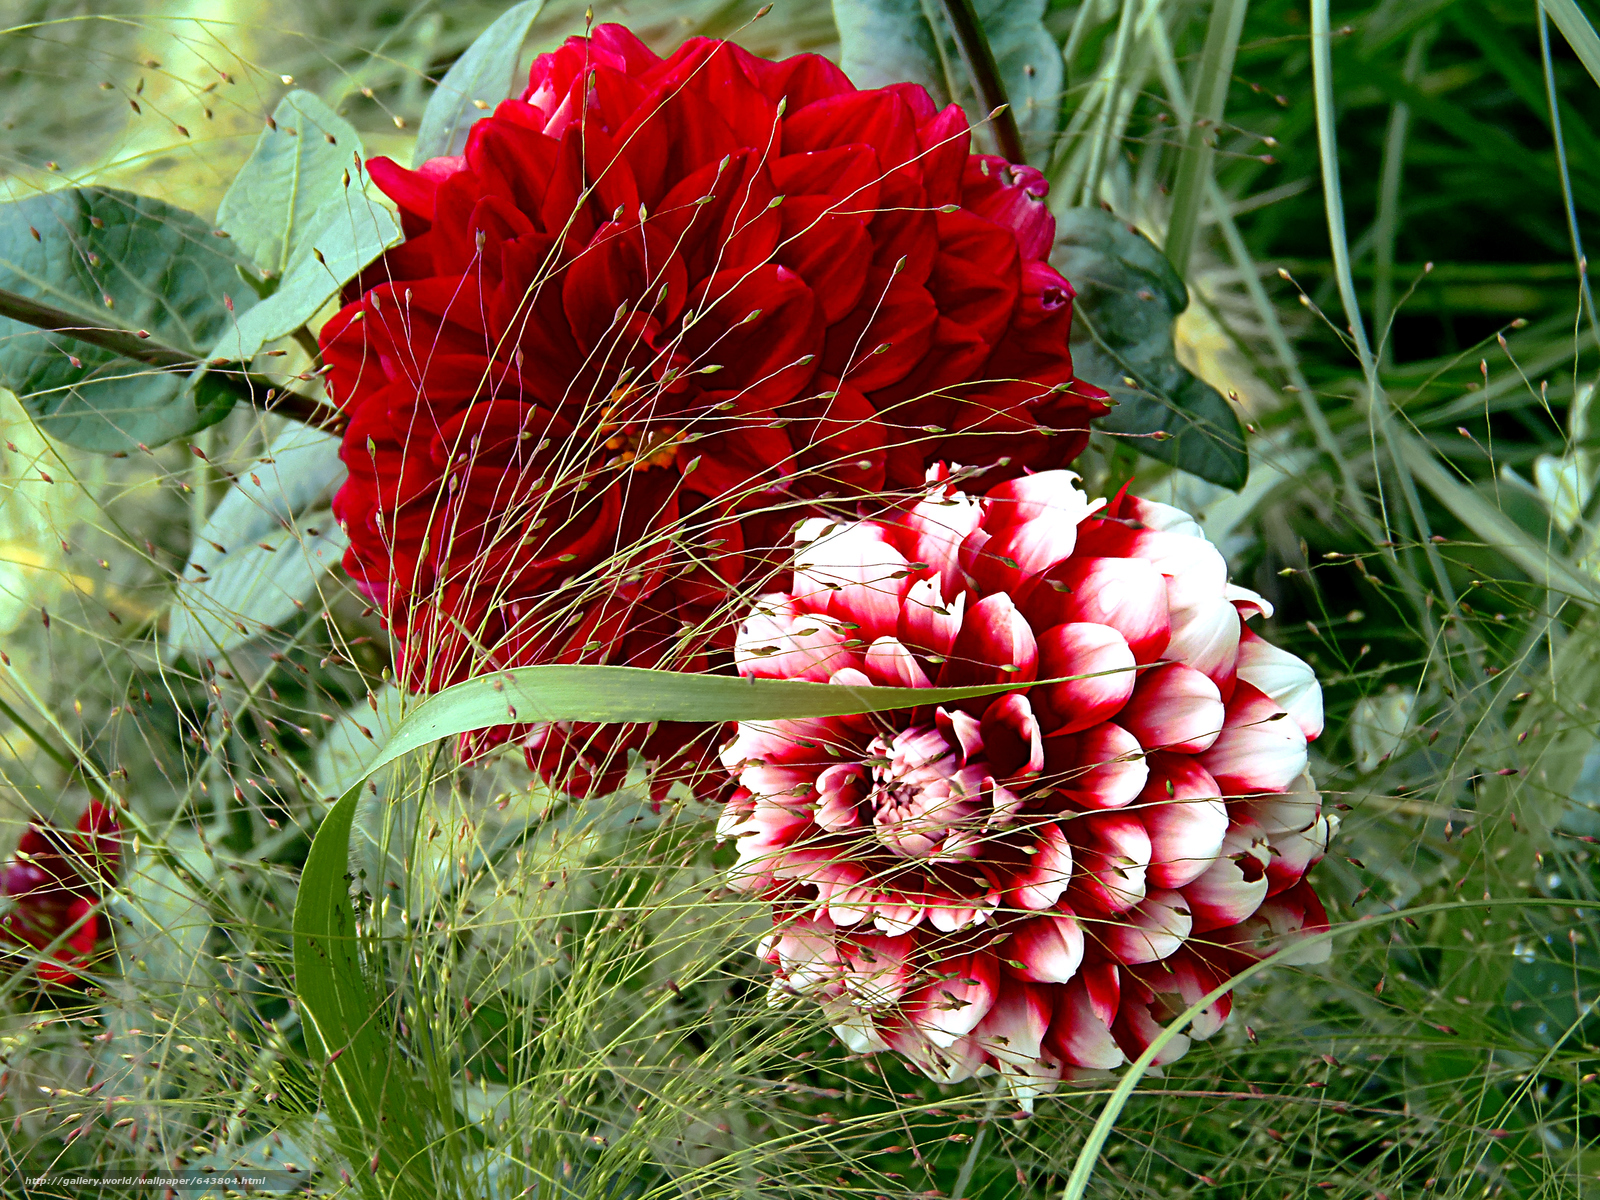 Download wallpaper dahlia,  Flowers,  flora free desktop wallpaper in the resolution 4288x3216 — picture №643804